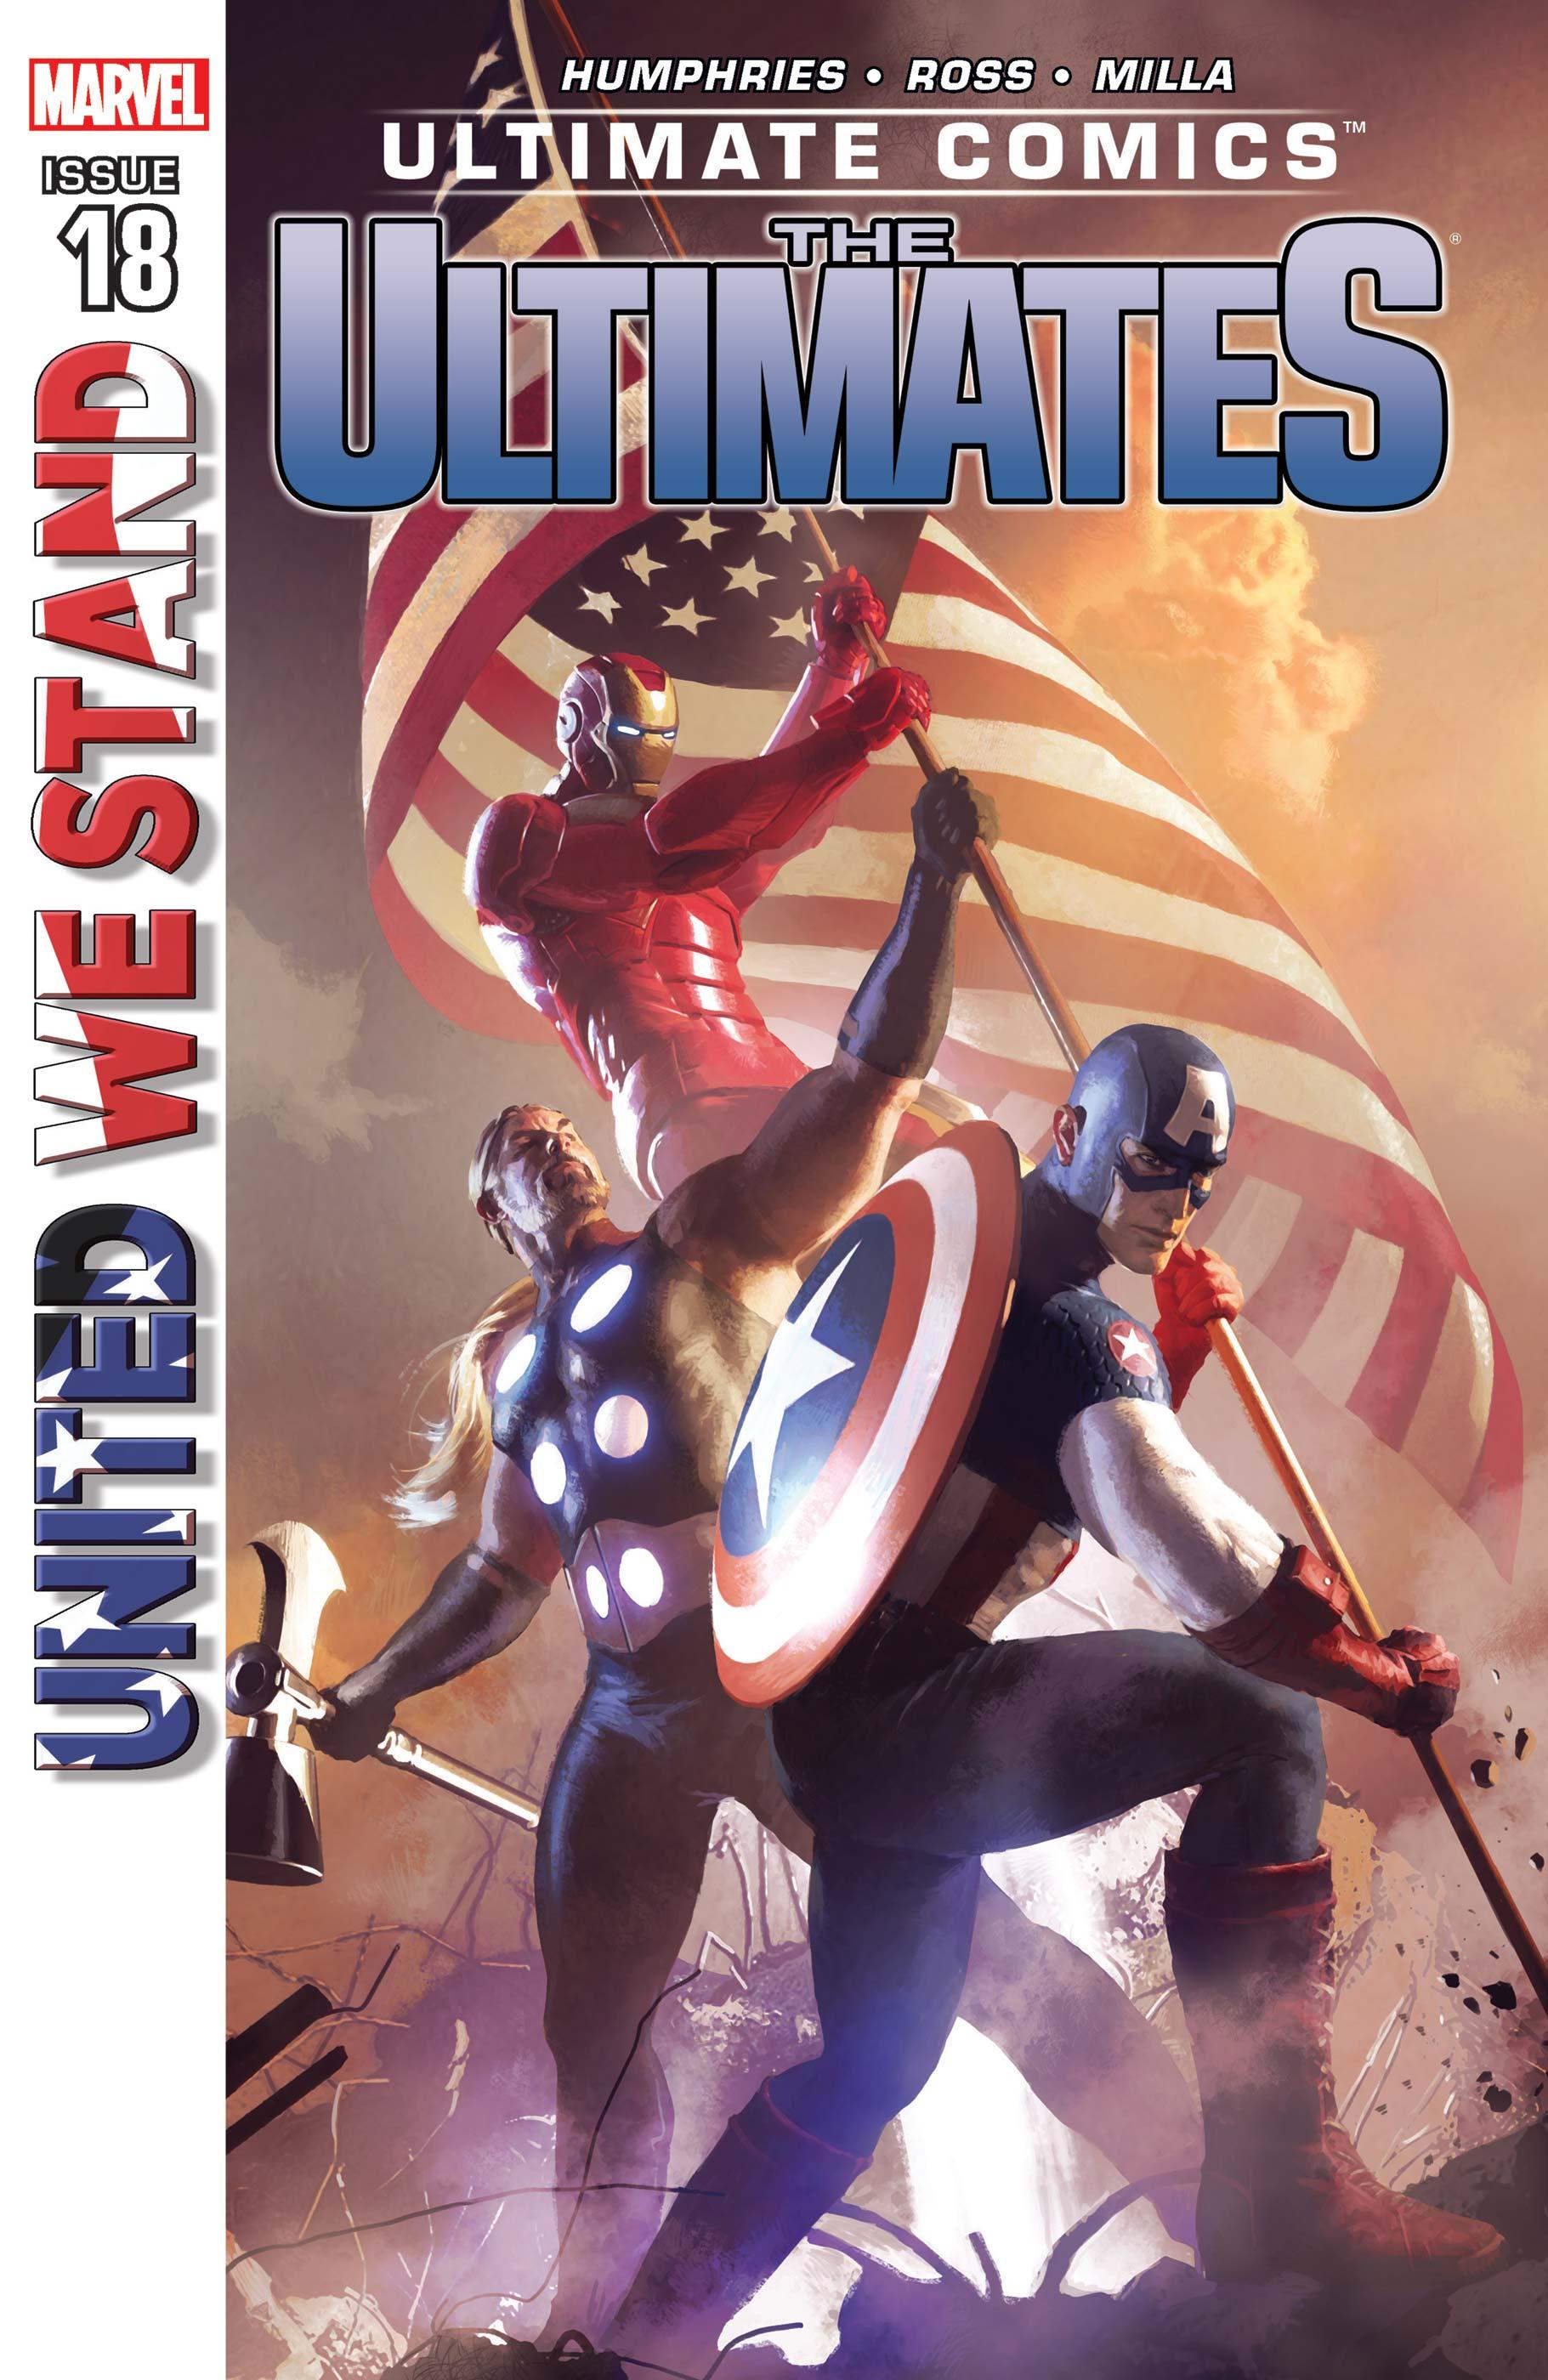 Ultimate Comics Ultimates (2011) #18